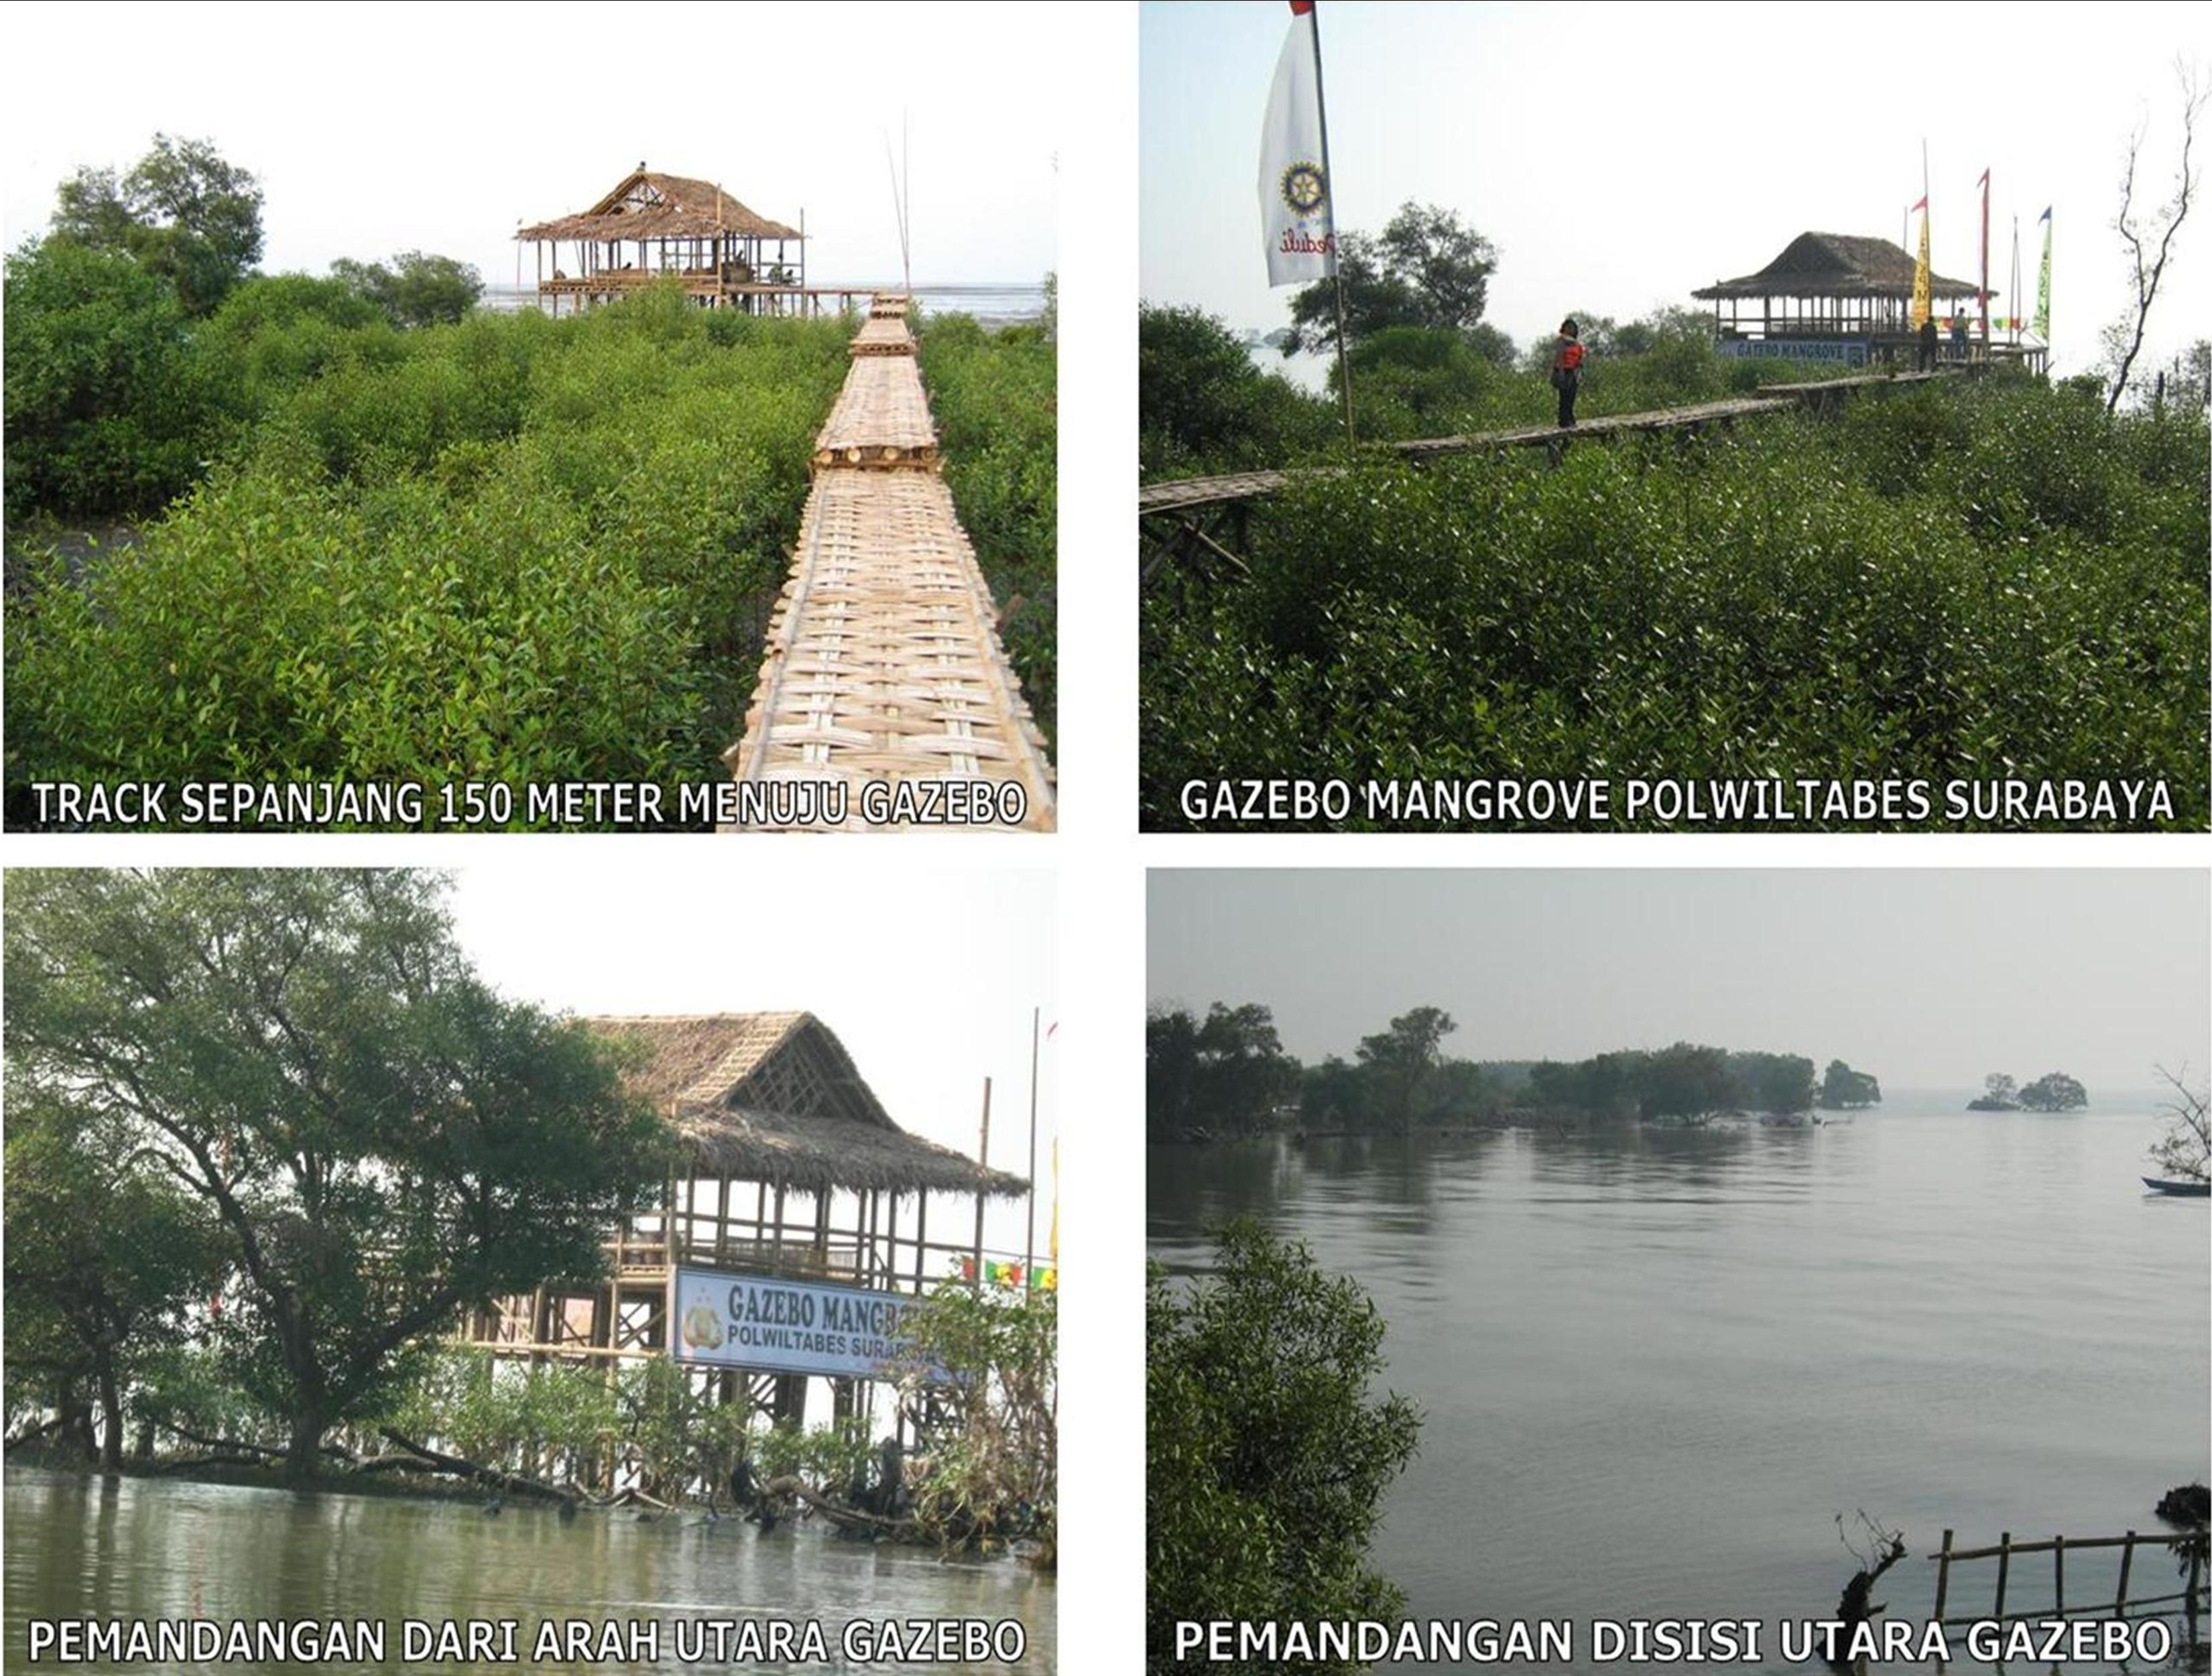 Picnic Hutan Wisata Mangrove Surabaya Tidak Tahu Panas Memiliki Bernama